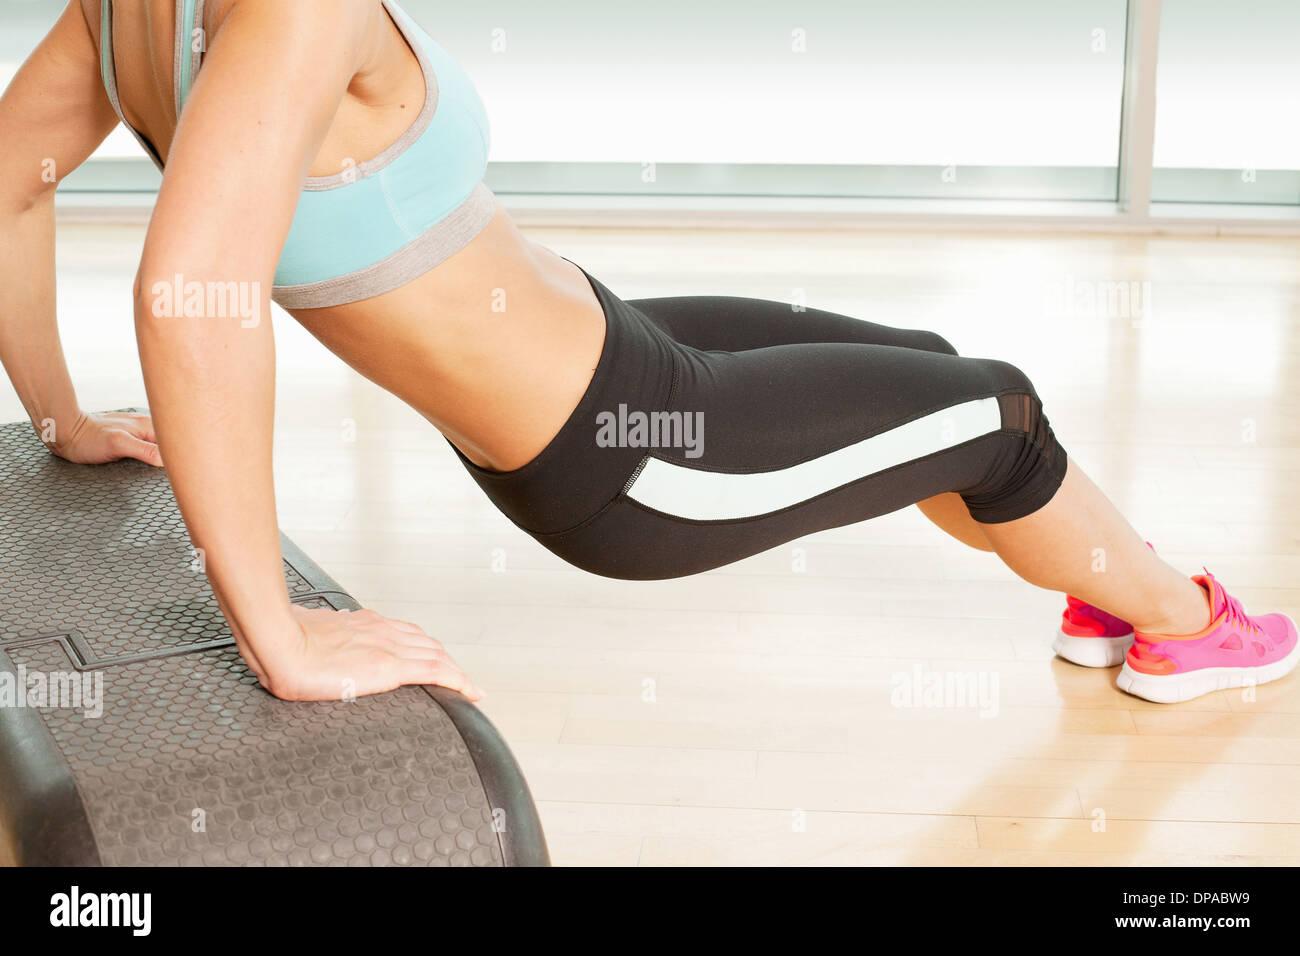 Woman stretching sur l'étape Photo Stock